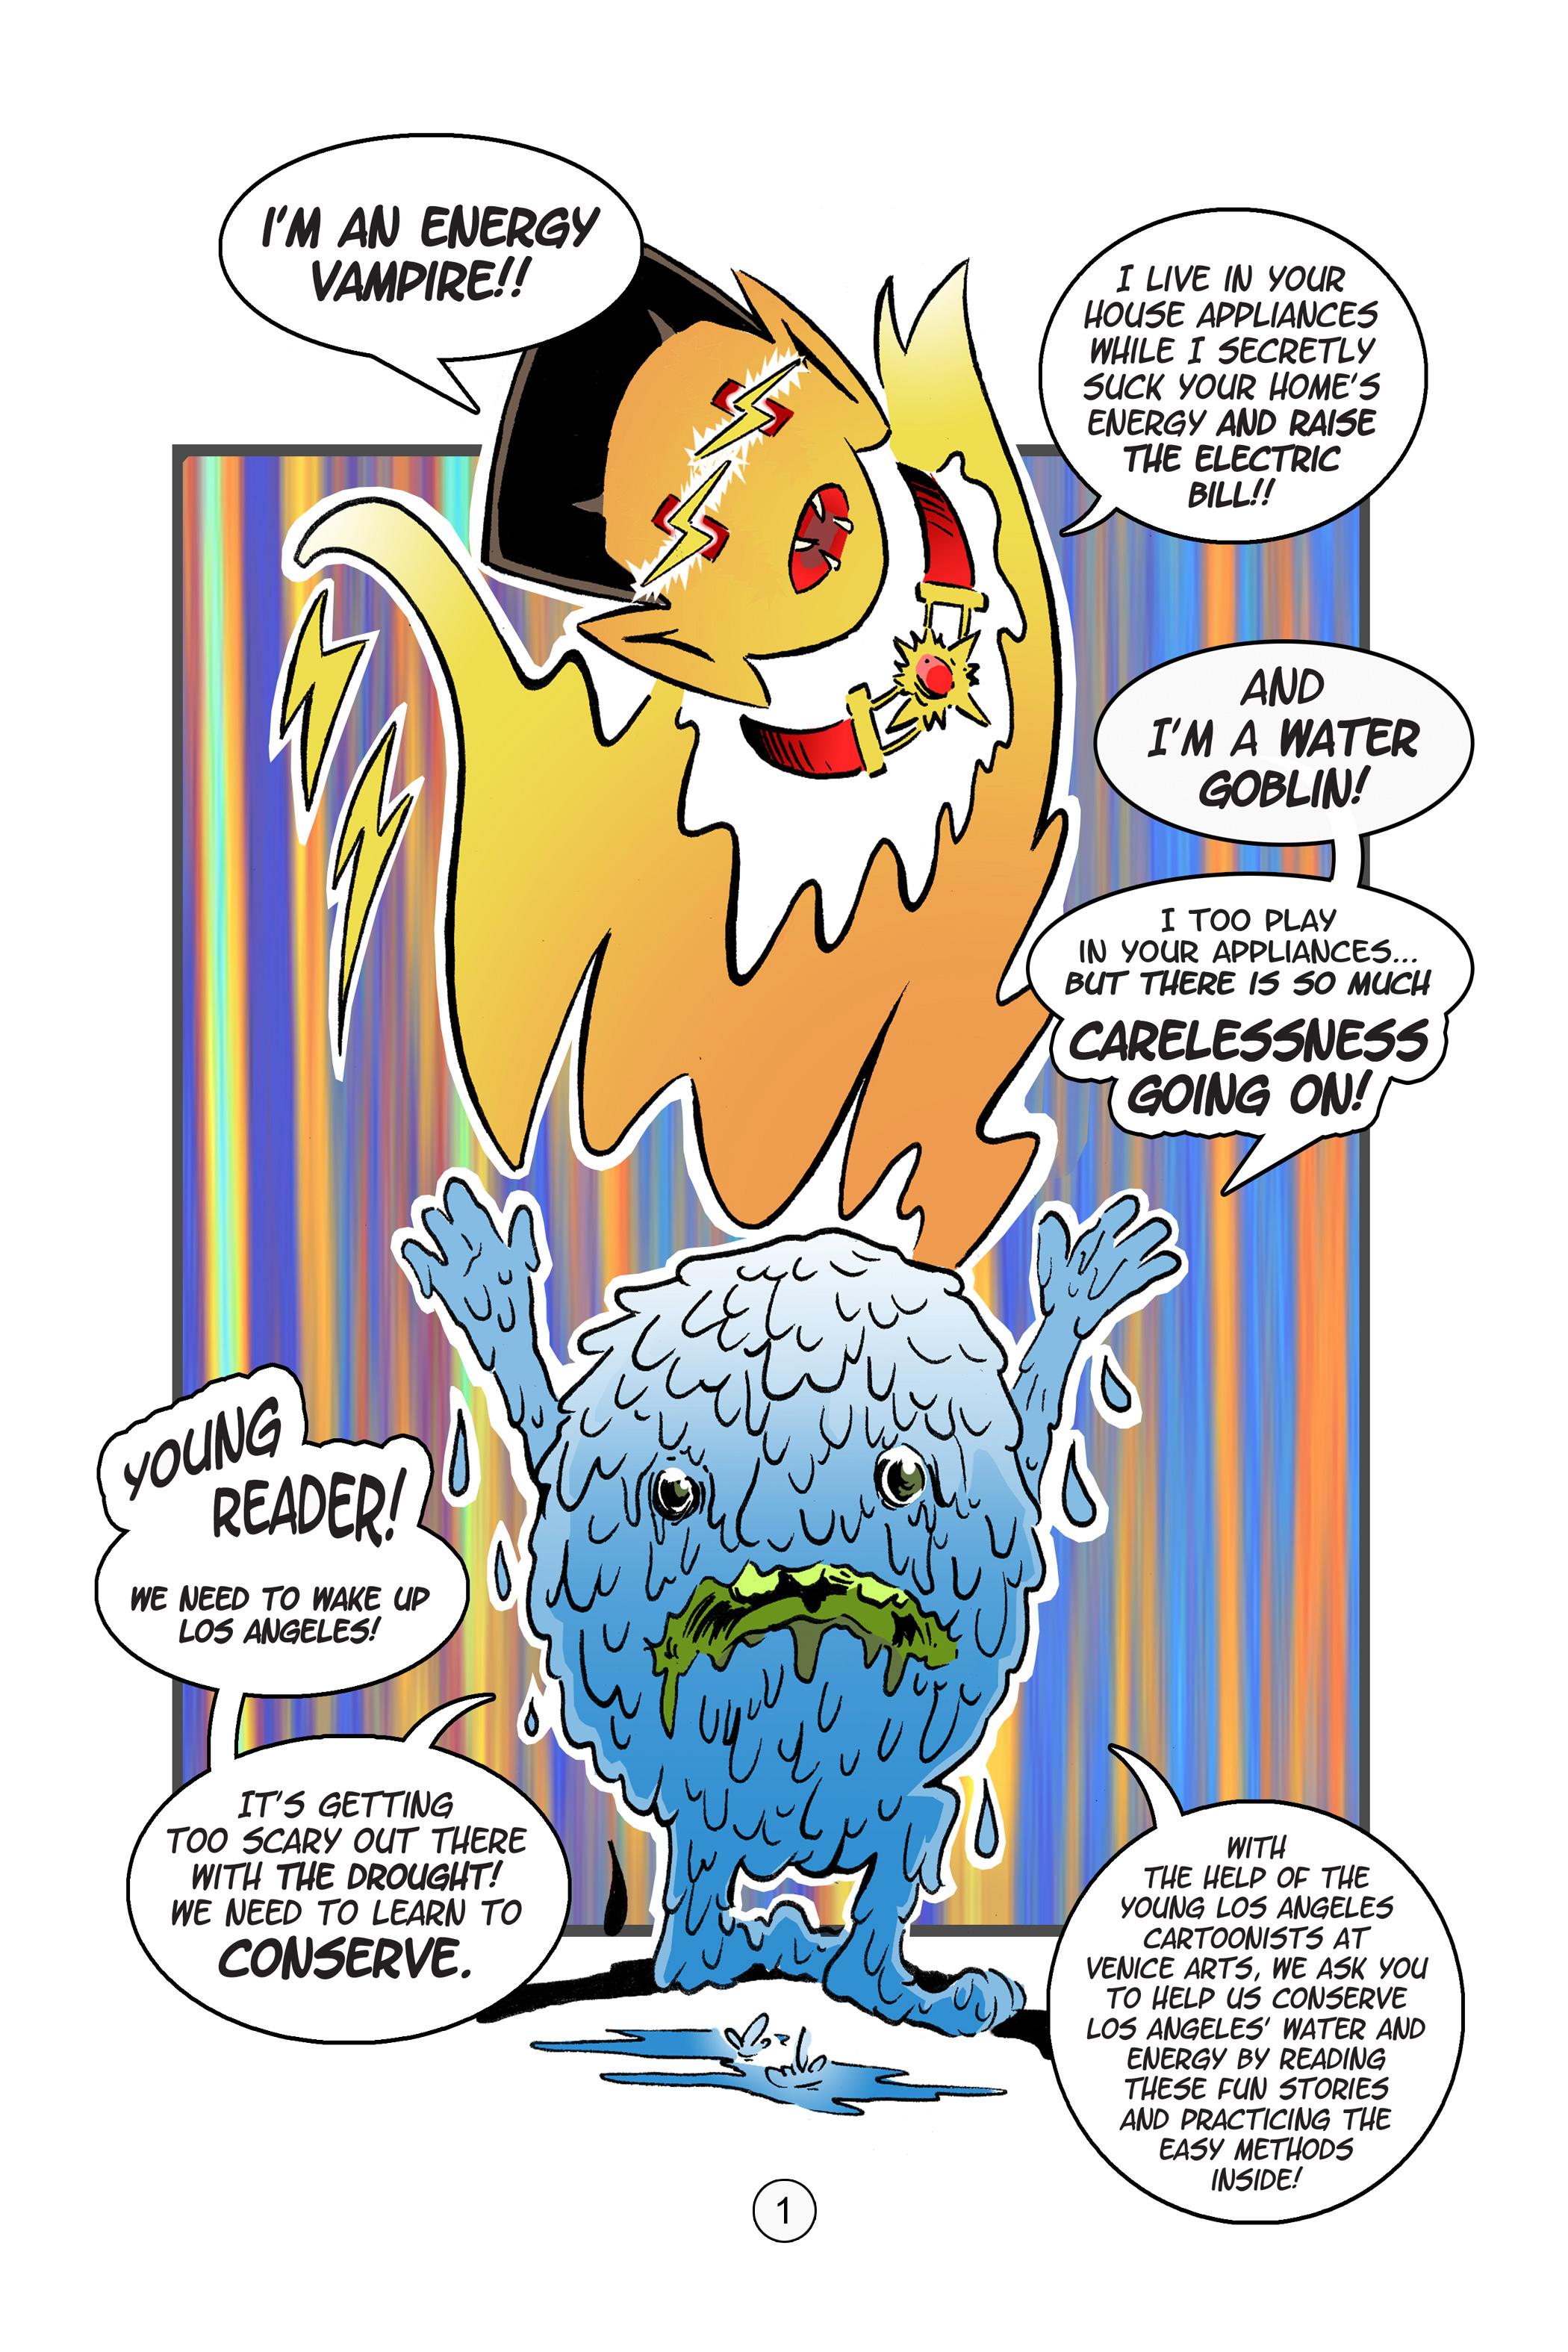 EVWP-Comic-Page-1.jpg